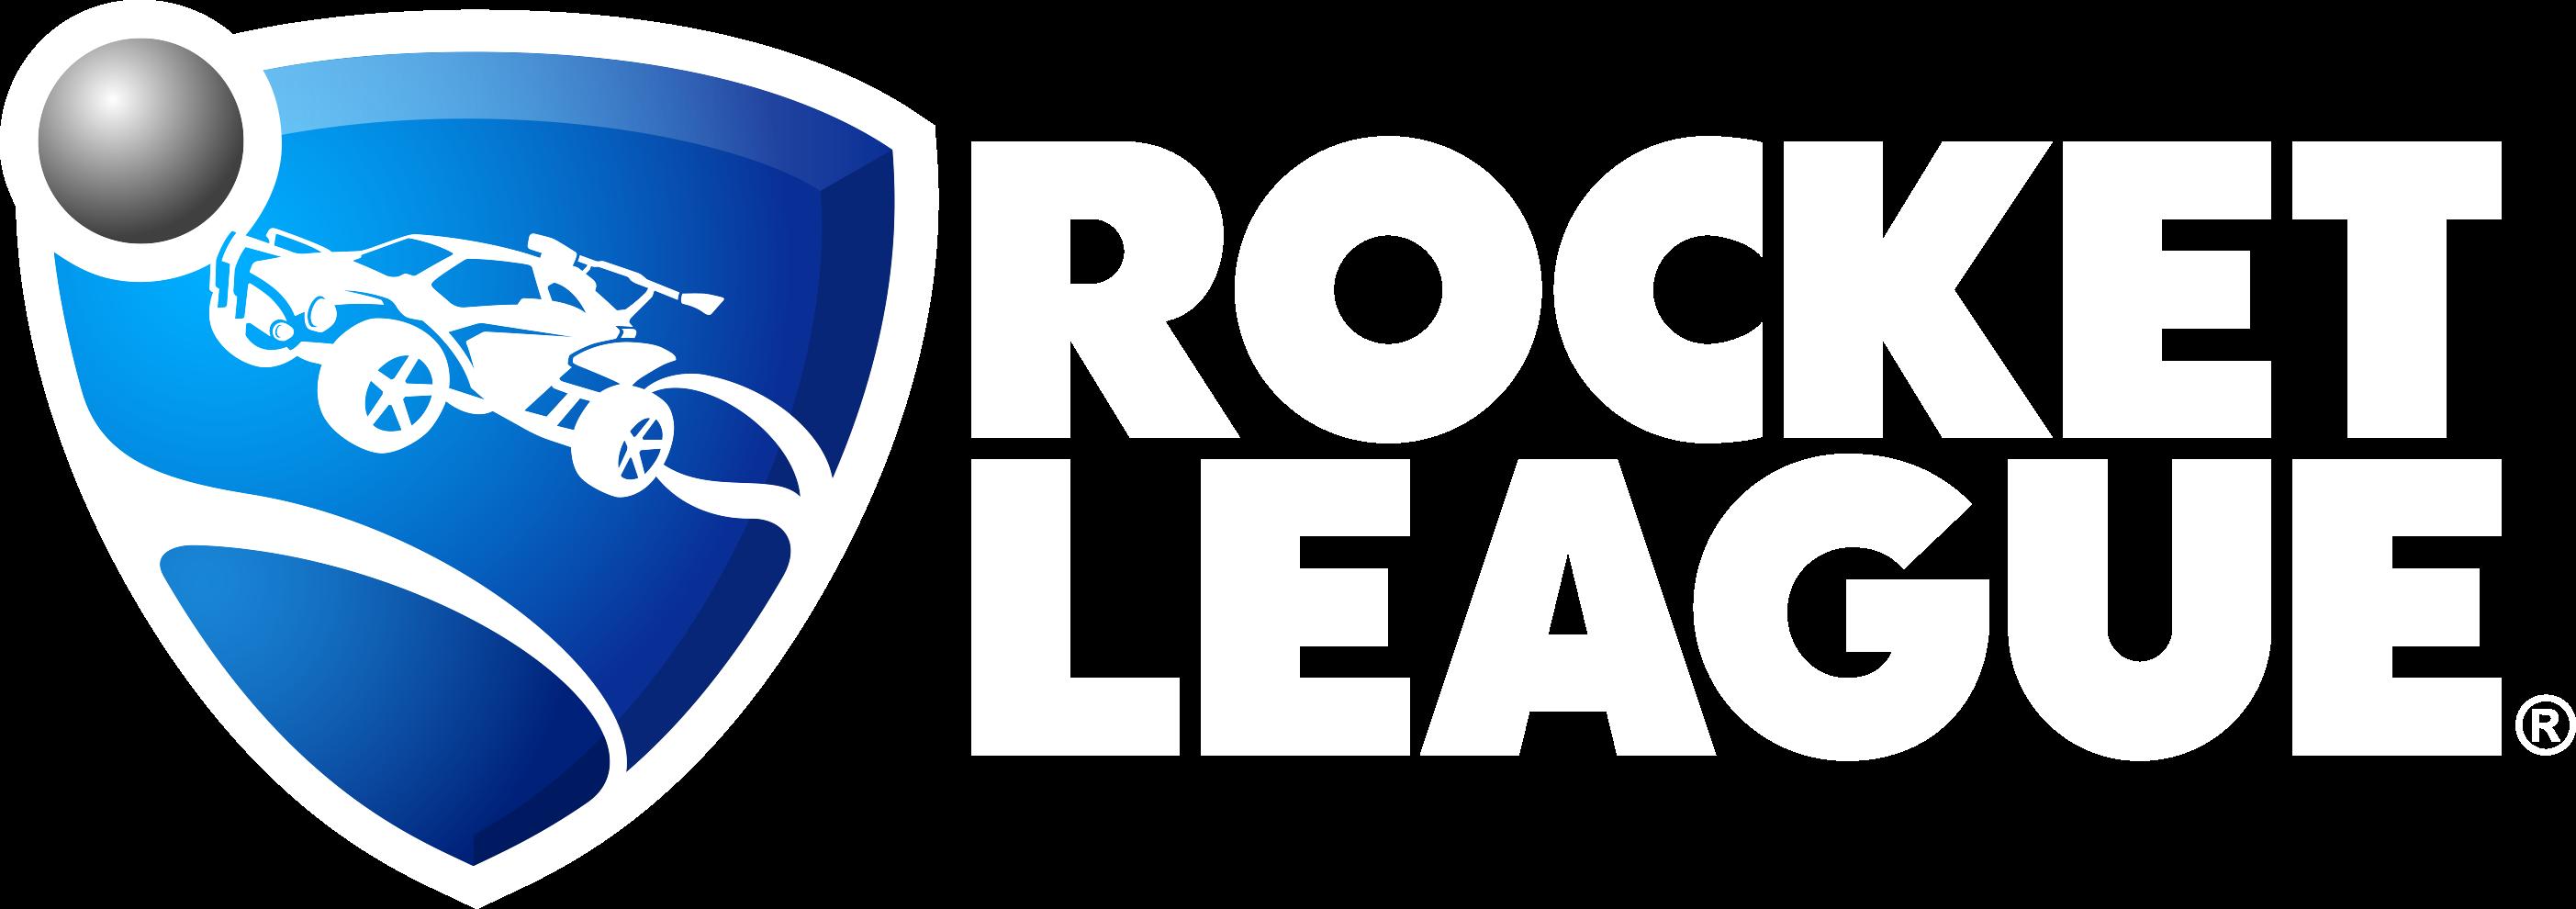 Momentum Series Speeds Into Rocket League Tomorrow Rocket League Official Site In 2021 Rocket League League Rocket